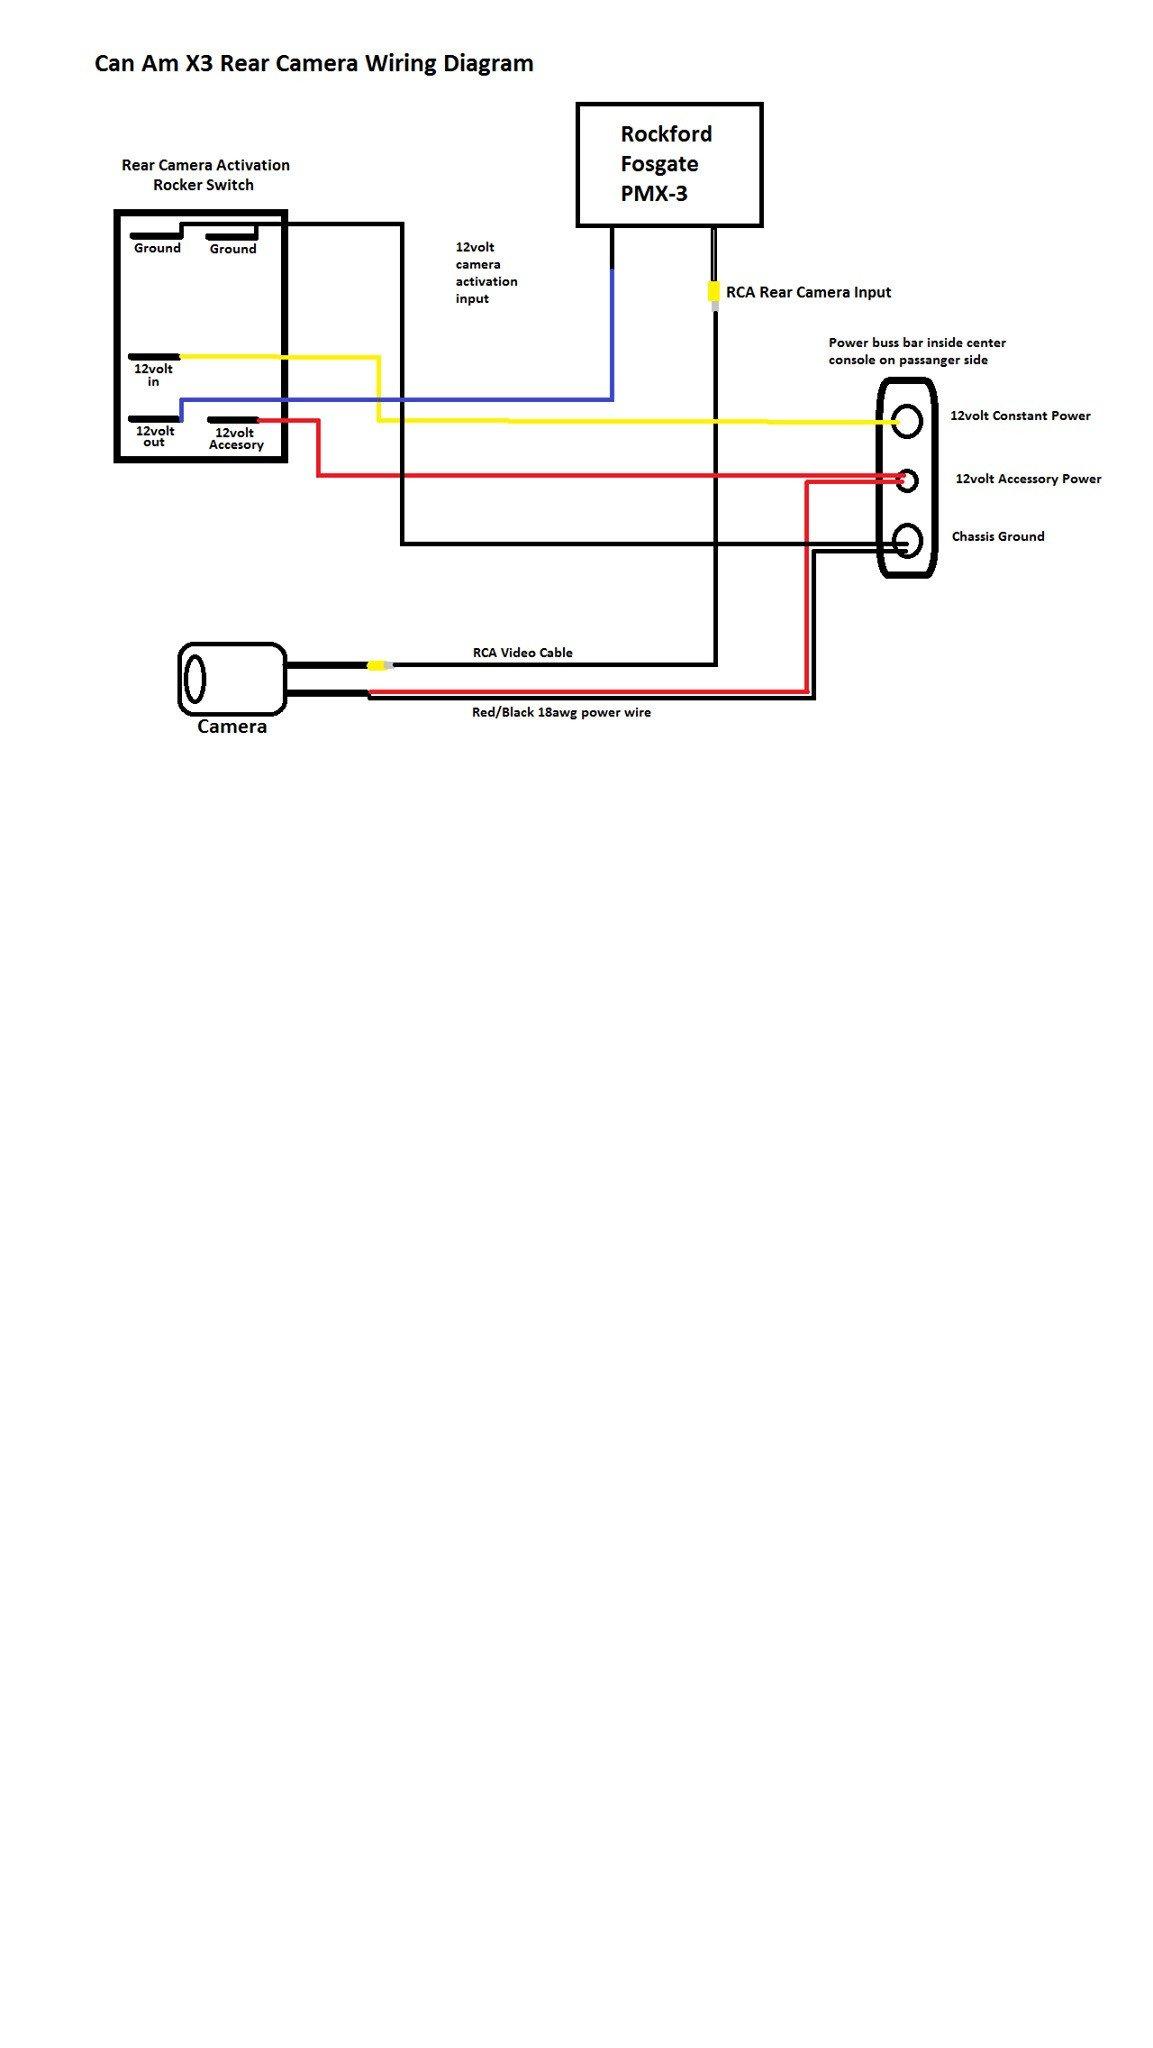 hight resolution of x3 rockford fosagate rear camera kit 2005 bmw x3 radio wiring diagram 04 bmw x3 radio wiring diagram